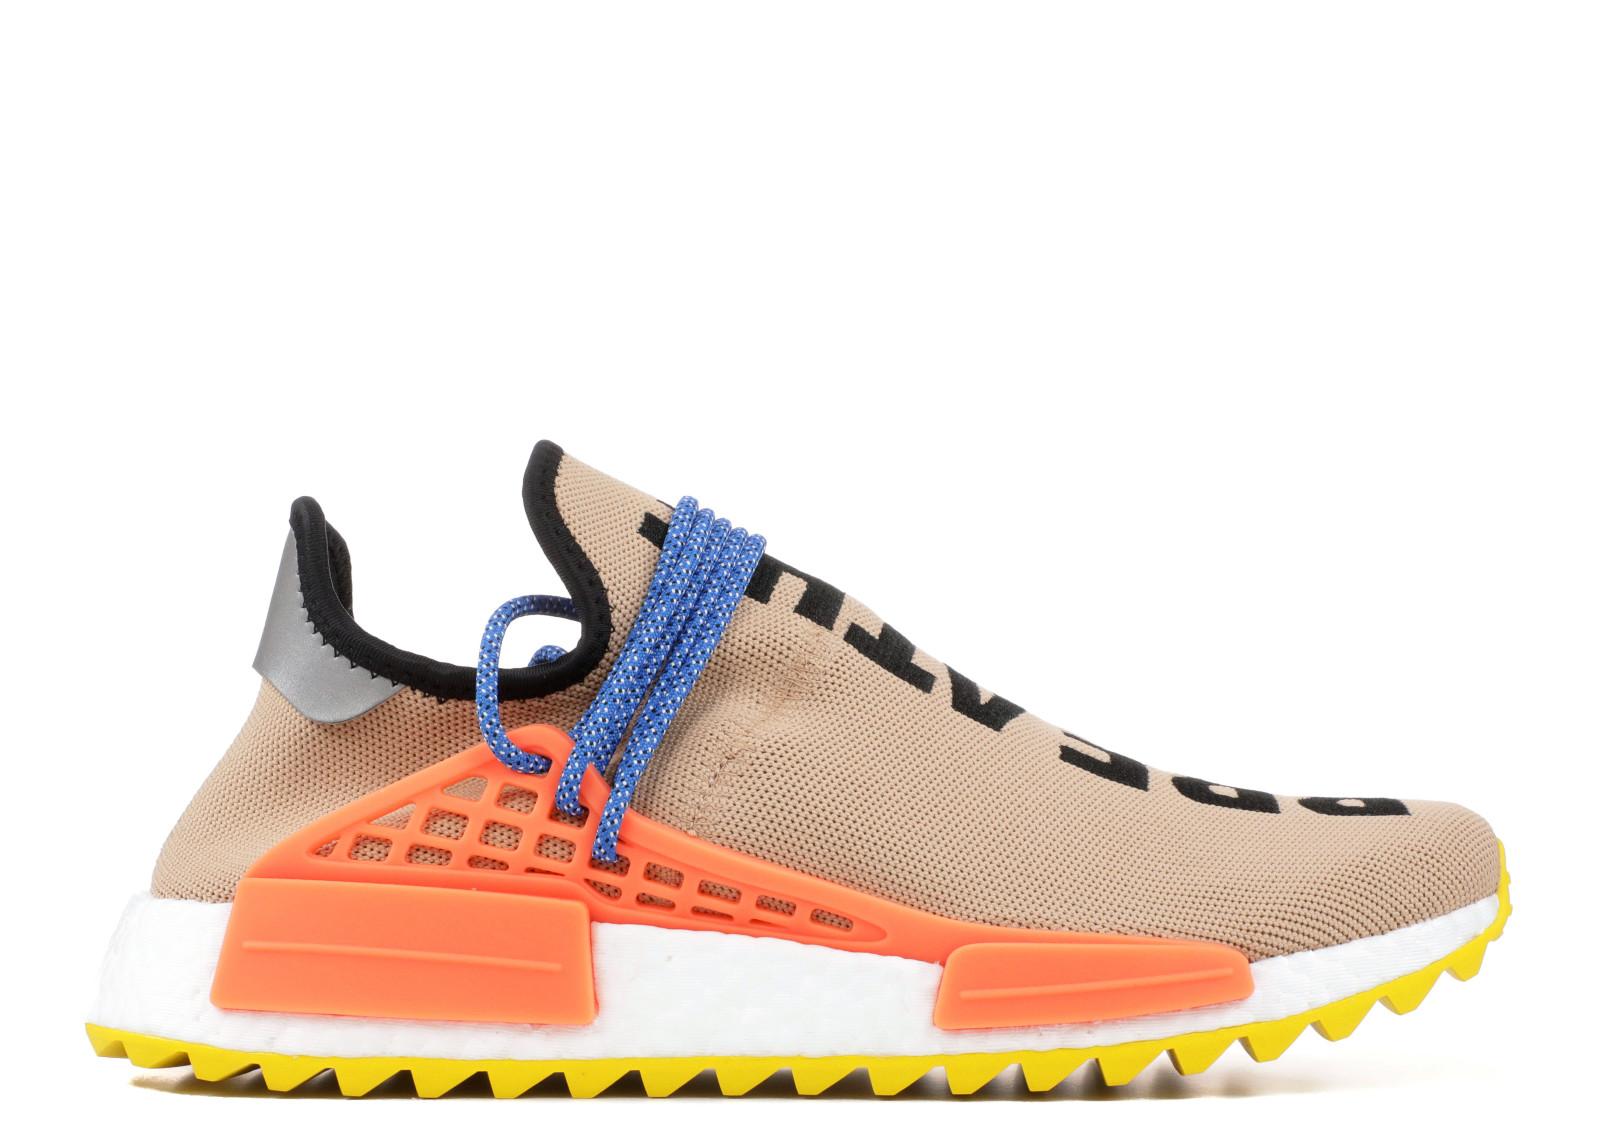 992651890 Adidas NMD Human Race Trail Pharrell Pale Nude